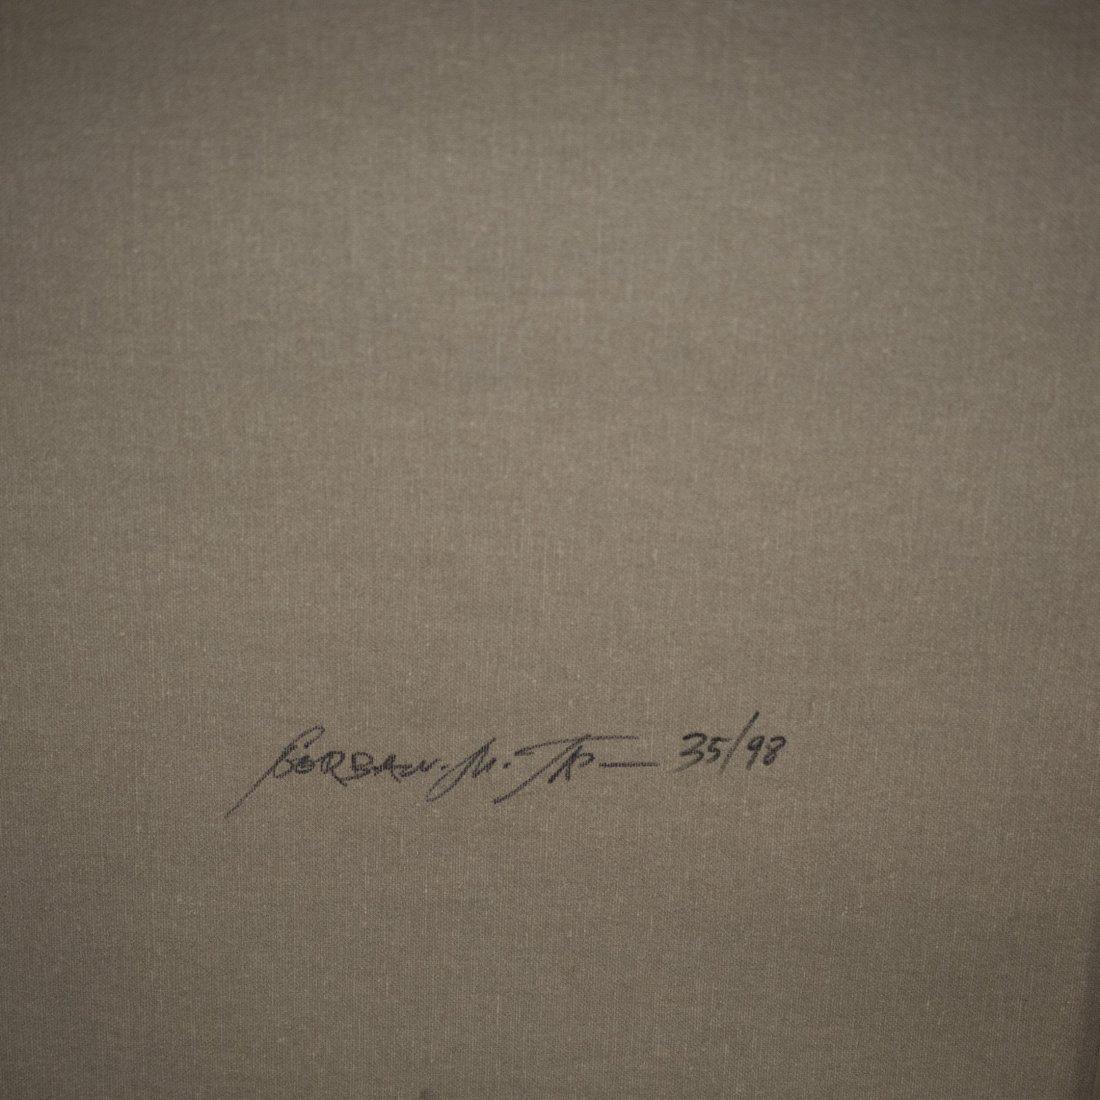 Michael Gorban(Israeli b. 1956) Serigraph - 3